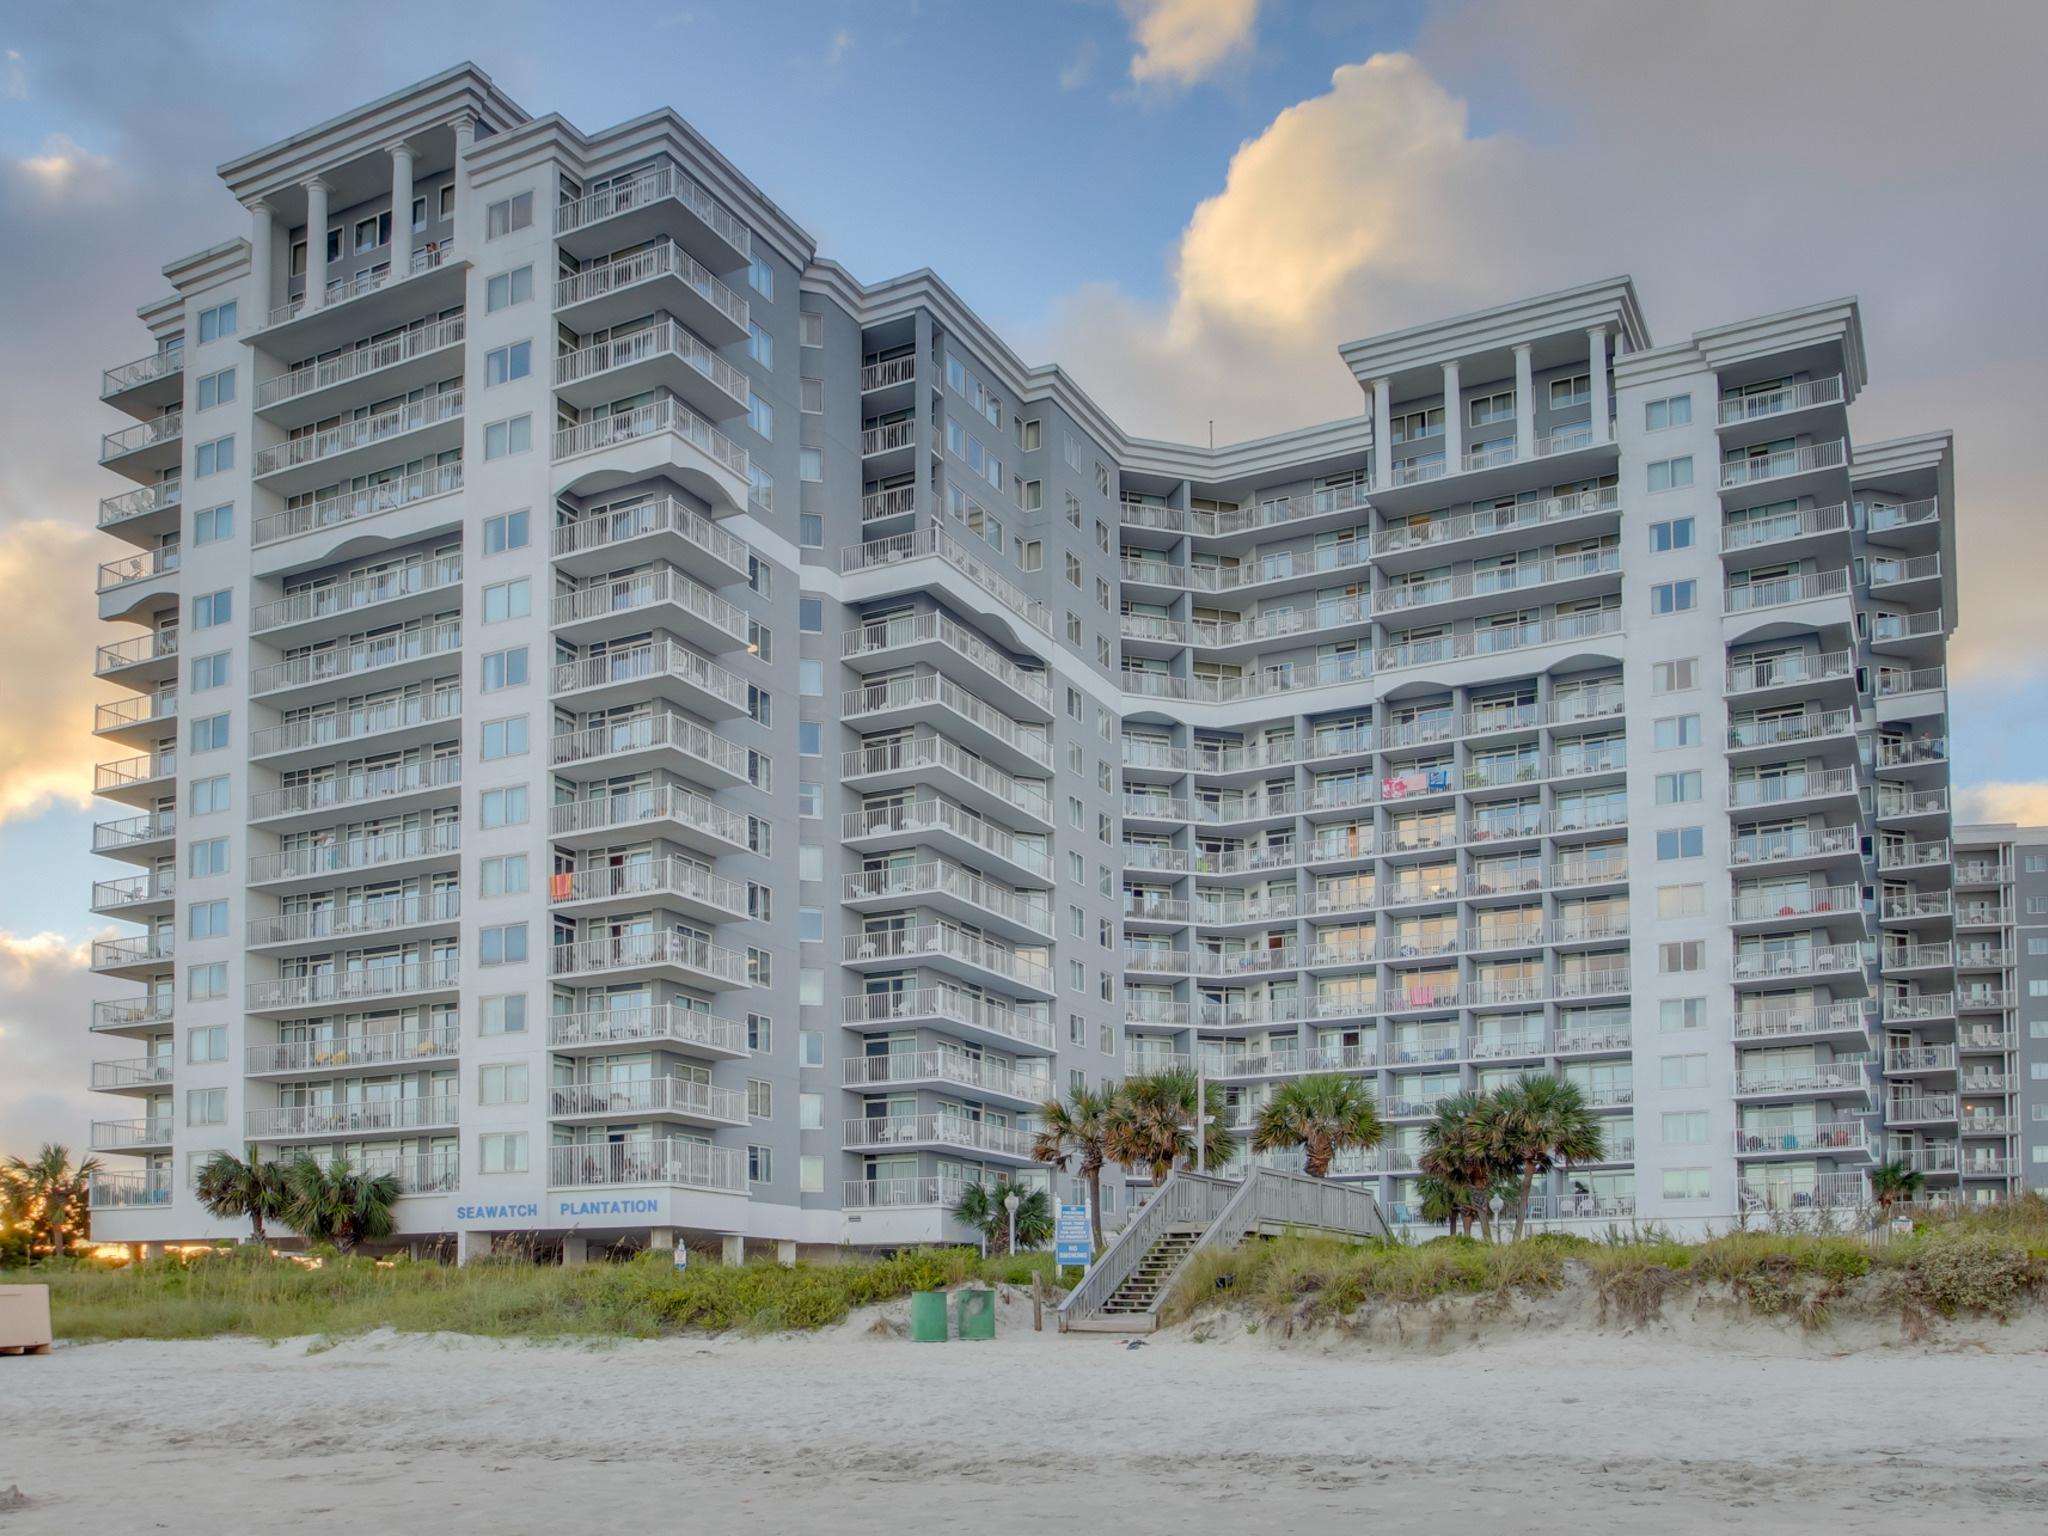 Apartment Seawatch Plantation 2 Bedrooms 2 Bathrooms photo 20365224